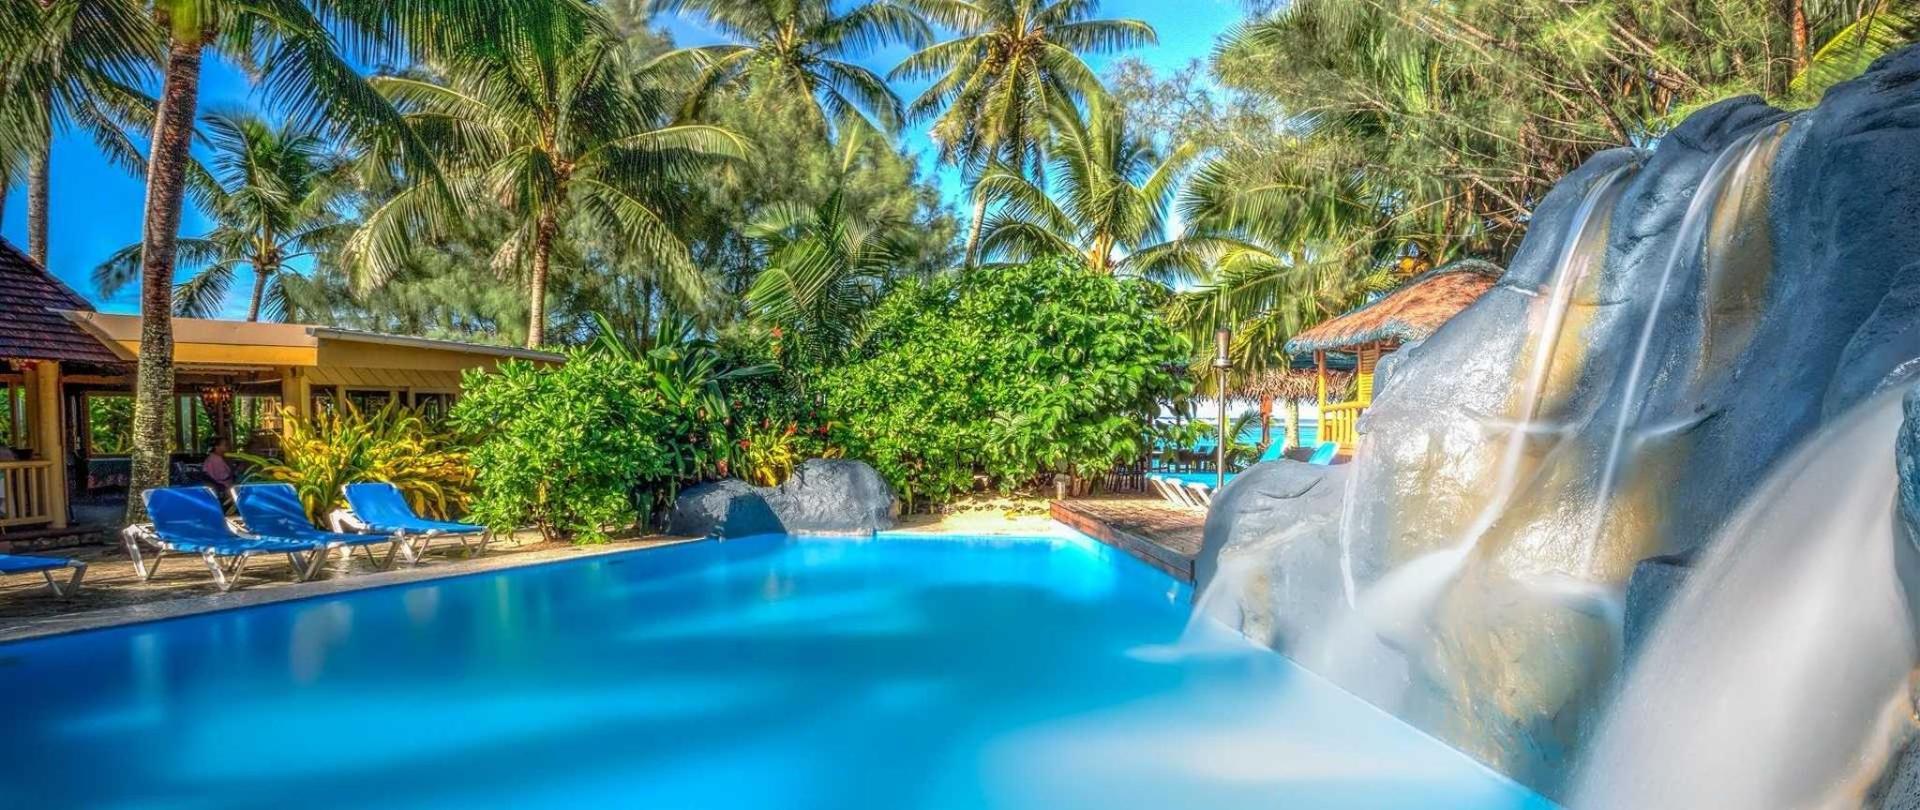 Landscape House The Rarotongan Beach Resort Amp Lagoonarium Rarotonga